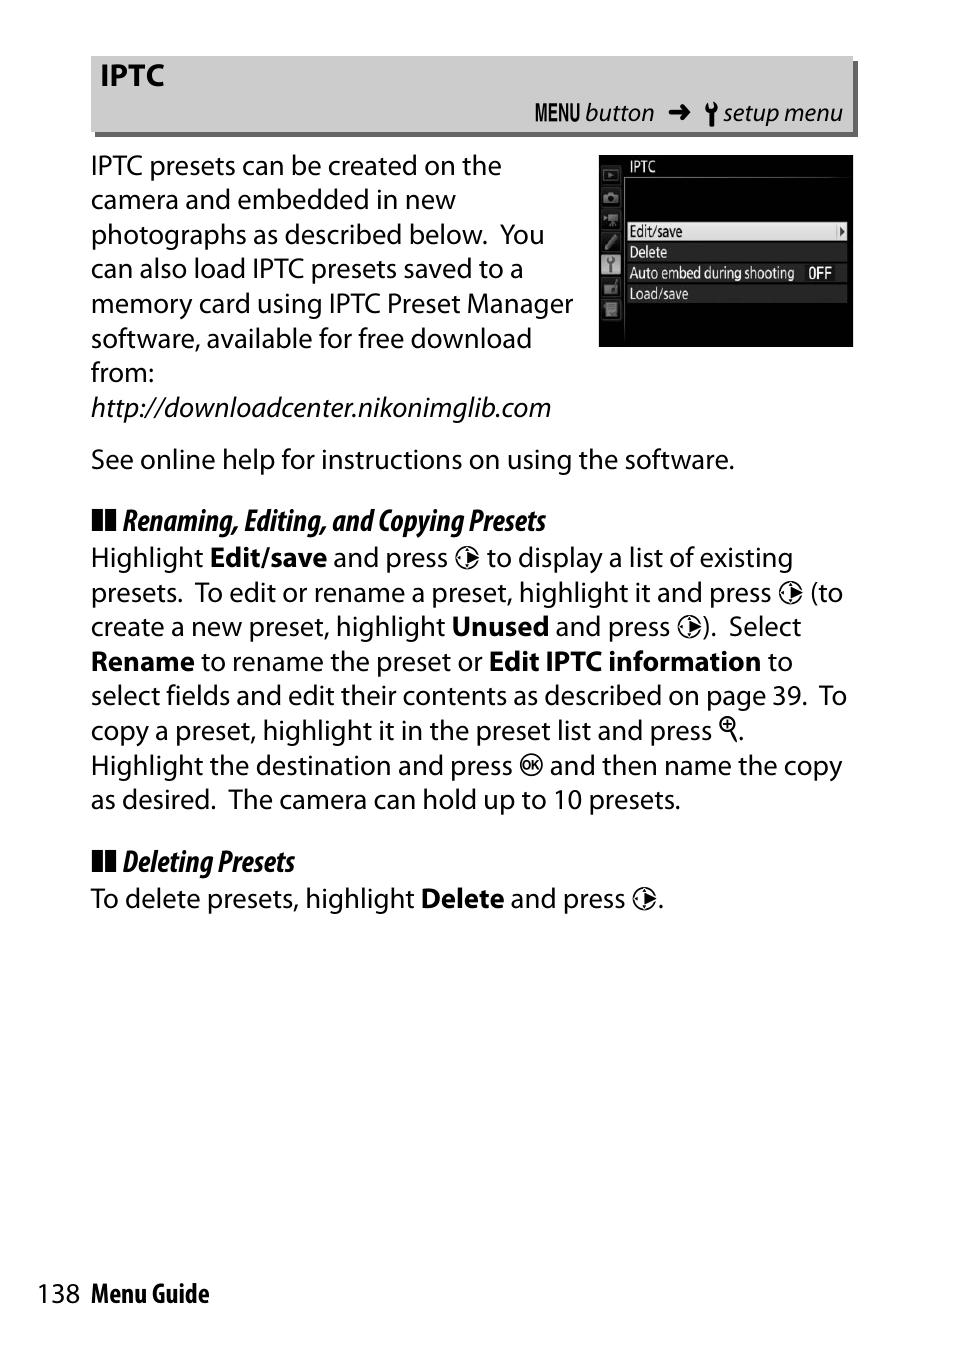 Iptc   Nikon D500 User Manual   Page 138 / 207